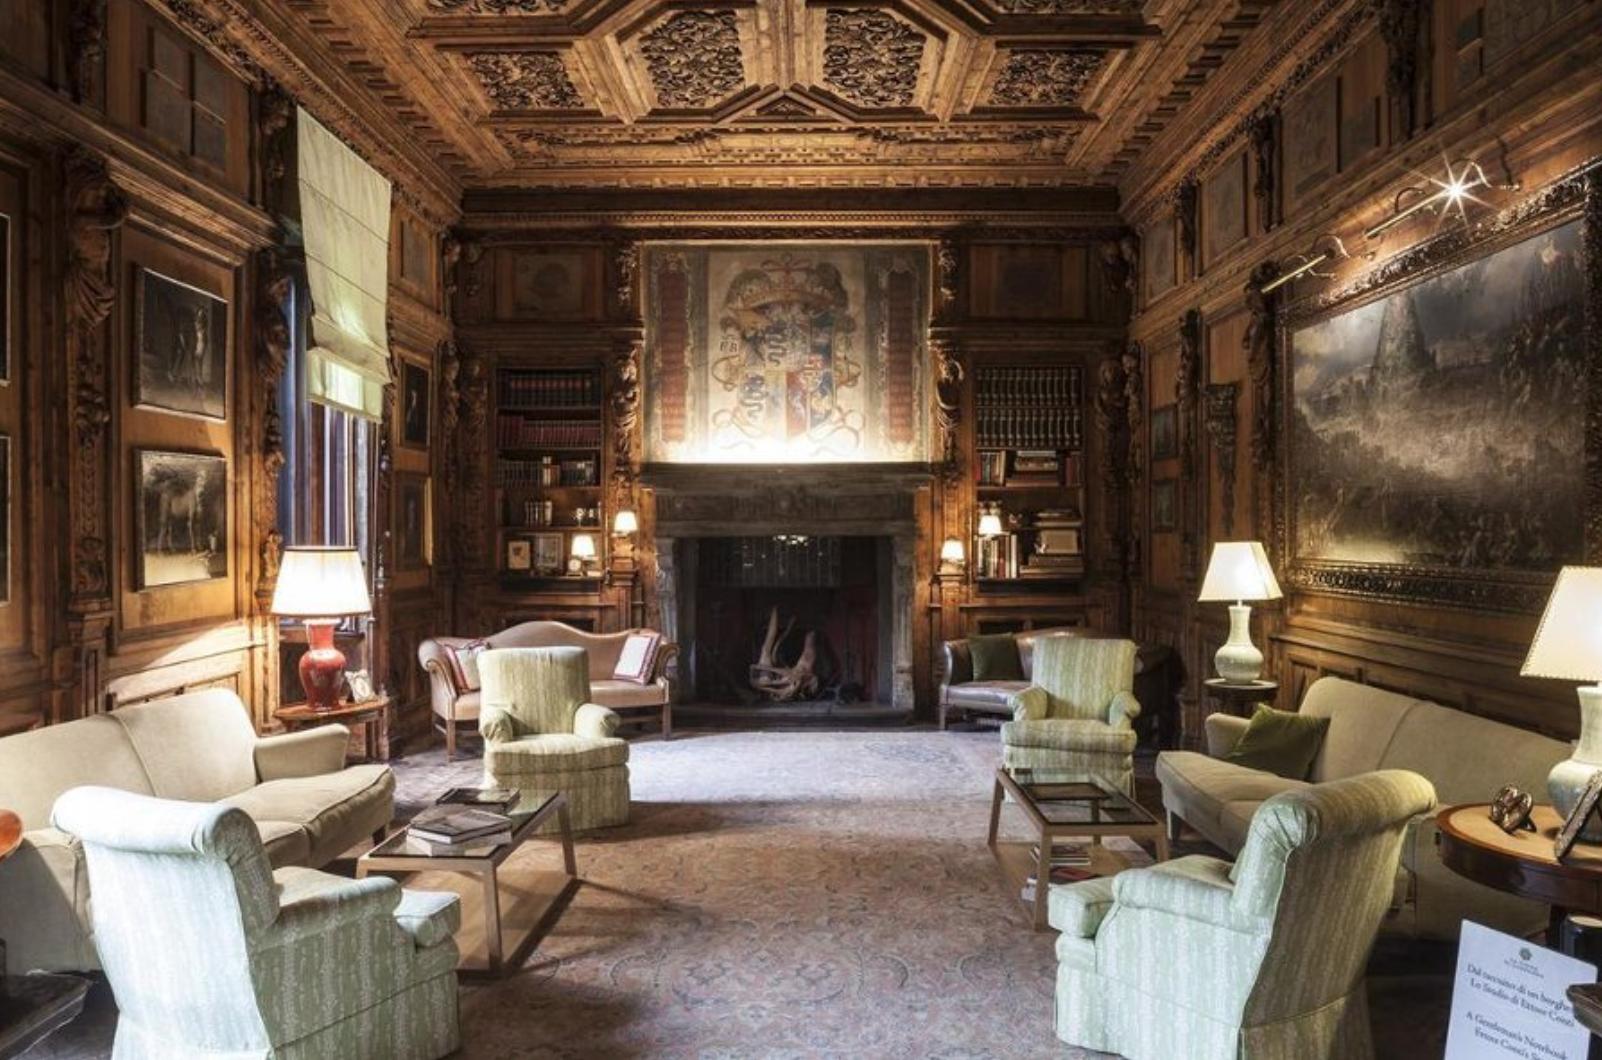 Fifteenth-century villa    Casa degli Atellani    made Goop's list. We can see why!